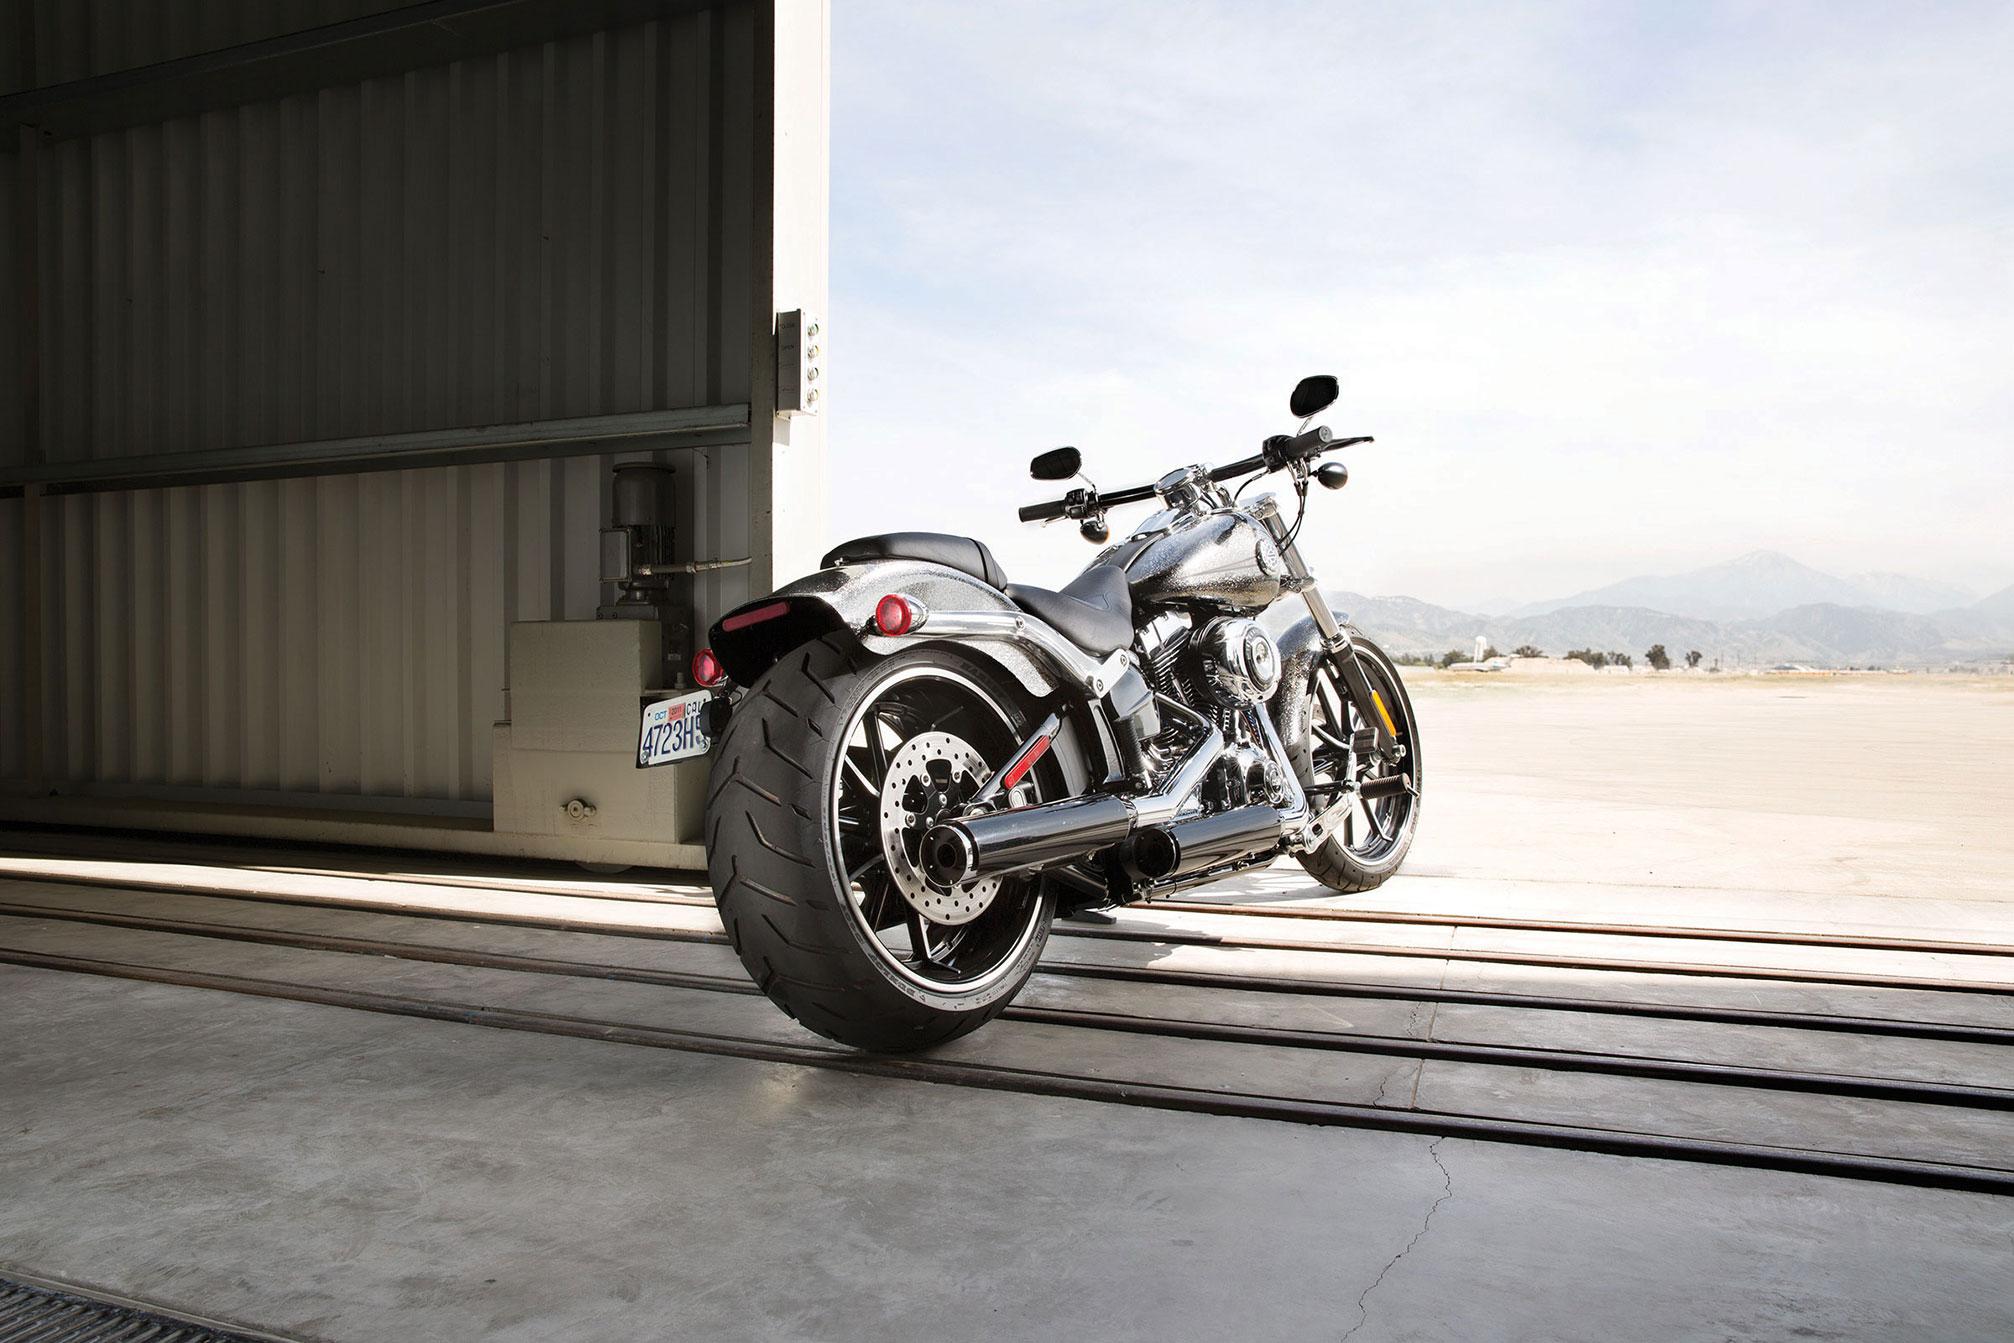 2014 Harley Davidson FXSB Breakout H Wallpaper